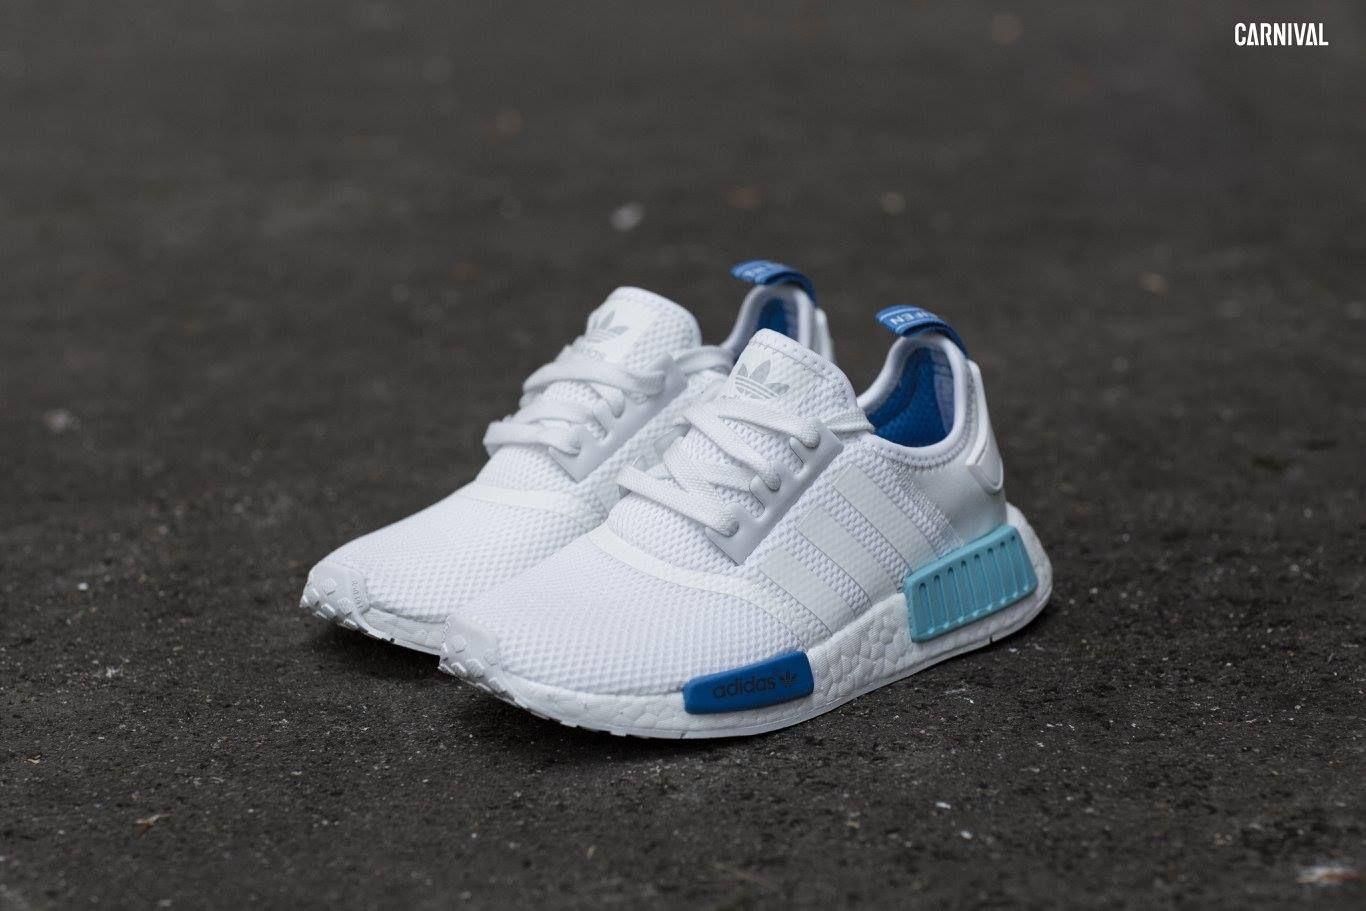 Foroffice Adidas Originals Nmd R1 Women City Pack White Blue